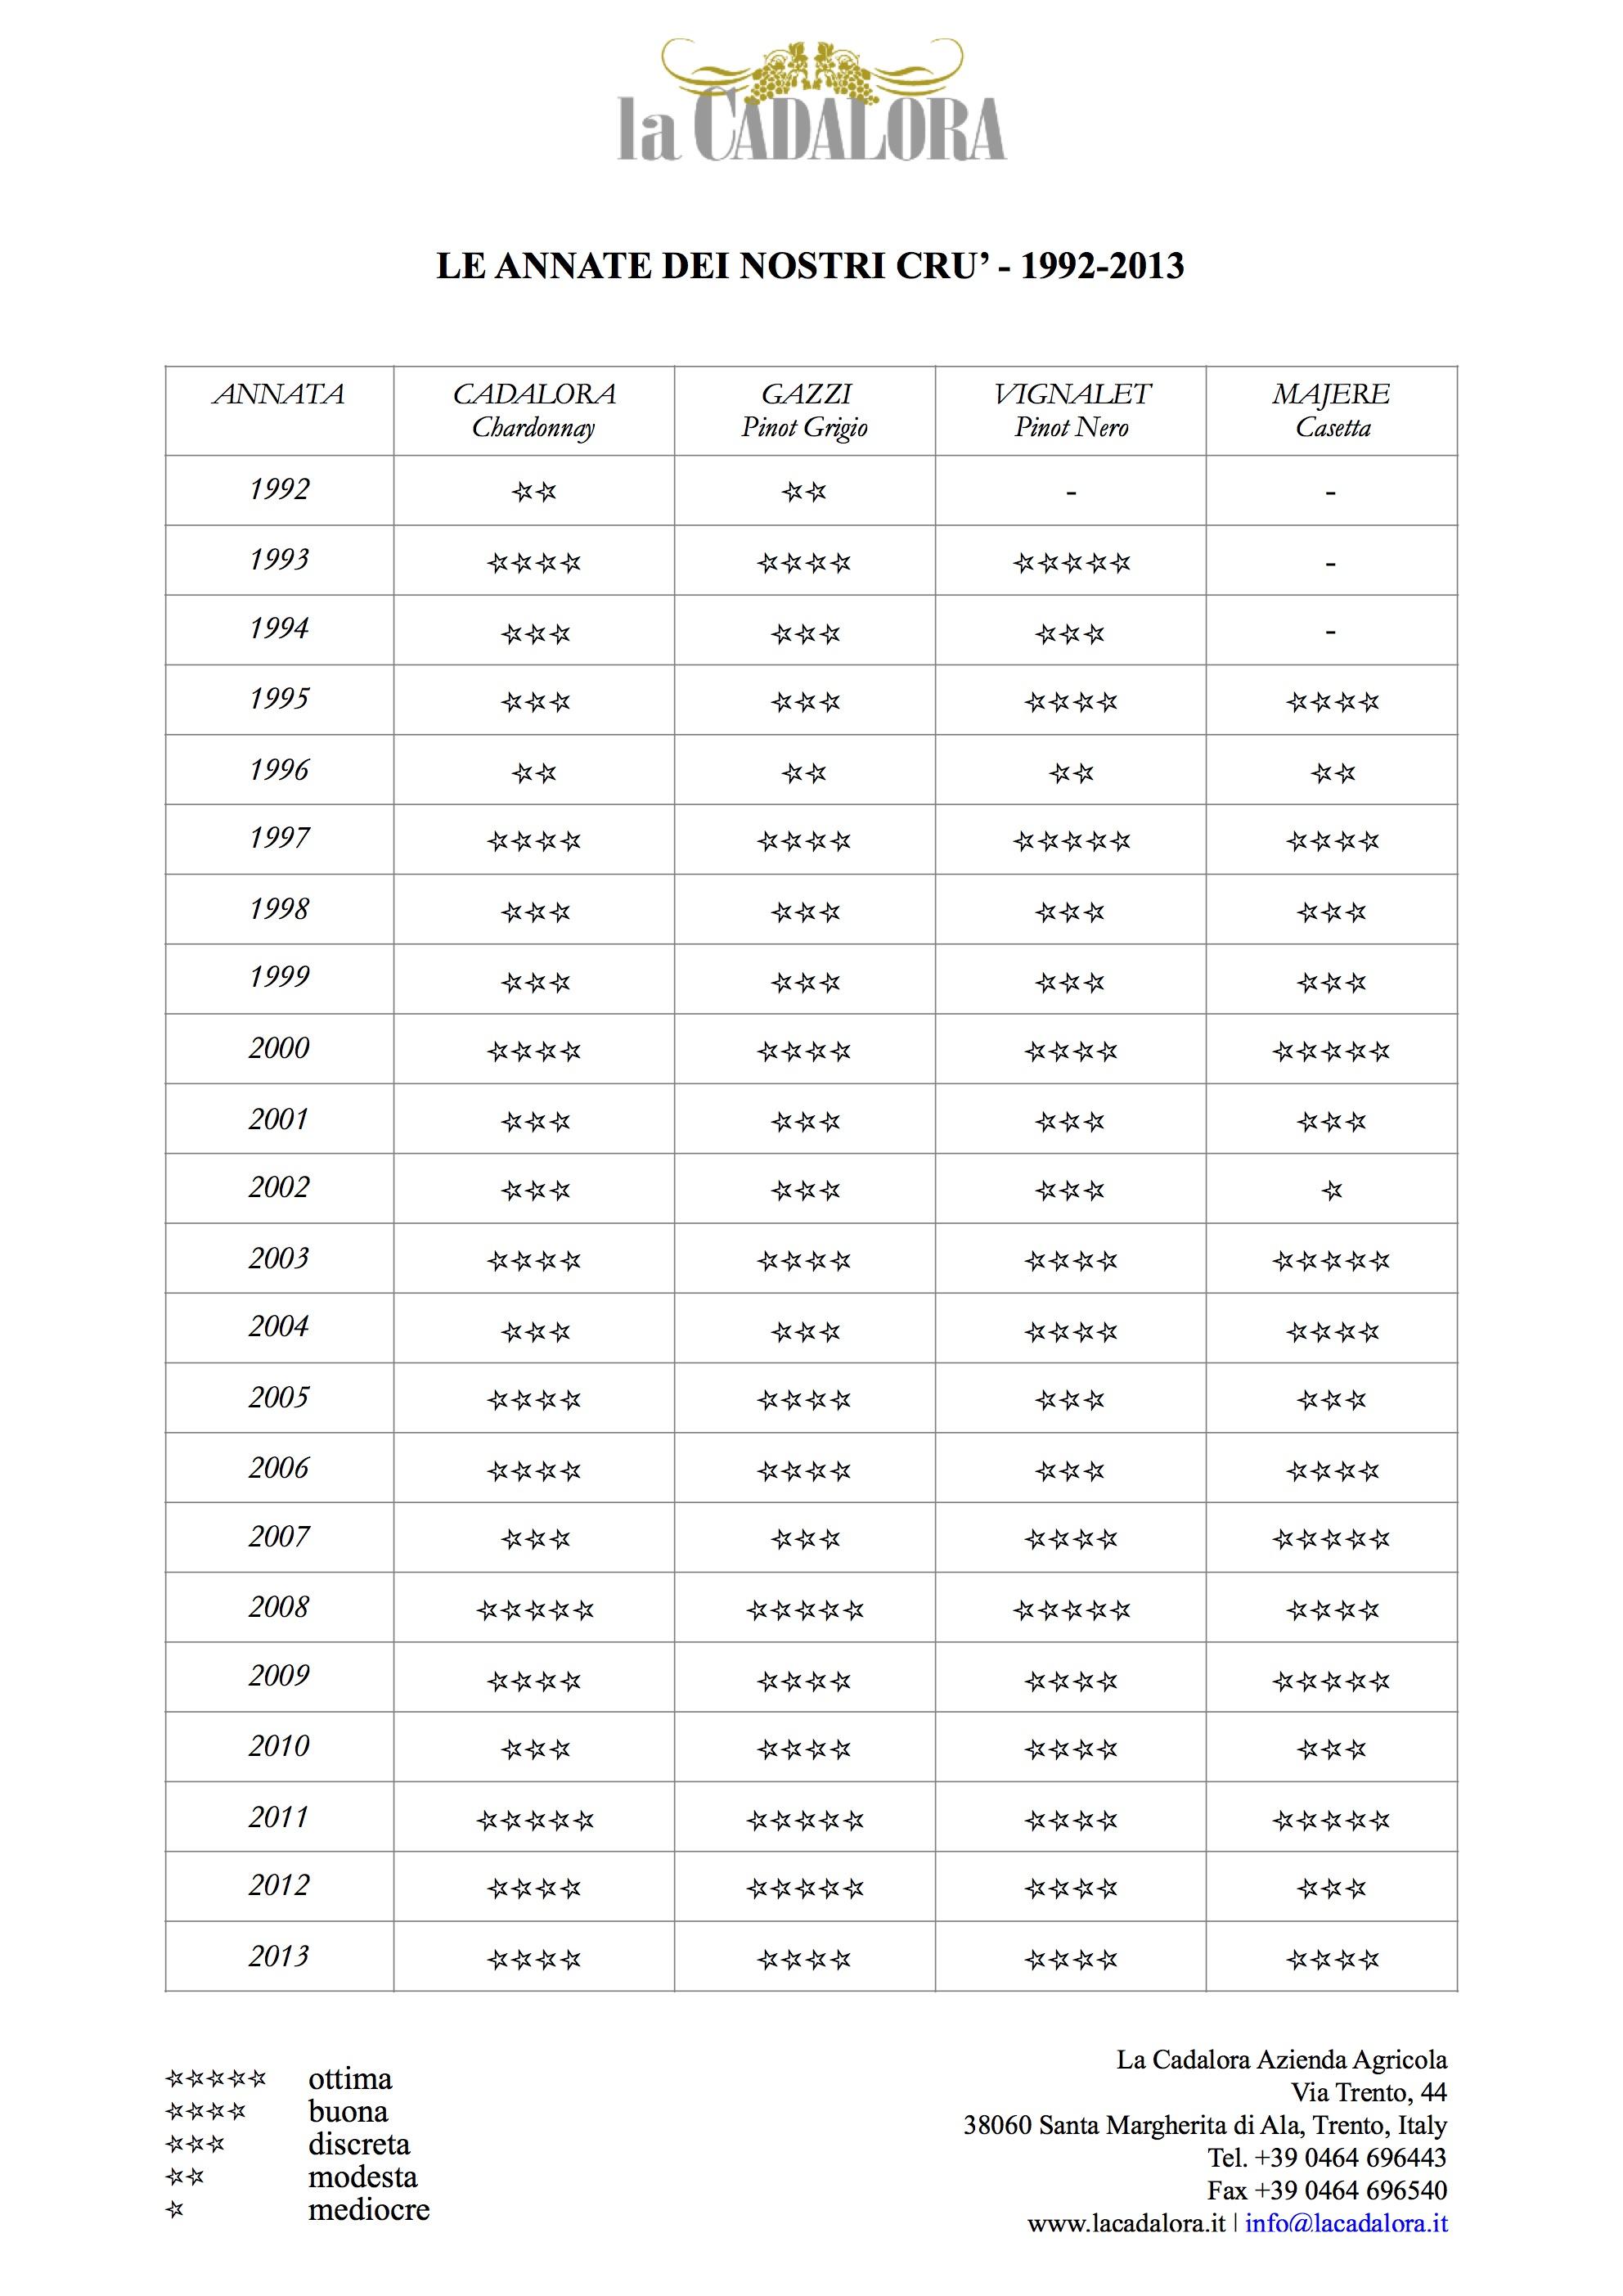 La Cadalora Annate 1992-2013.jpg